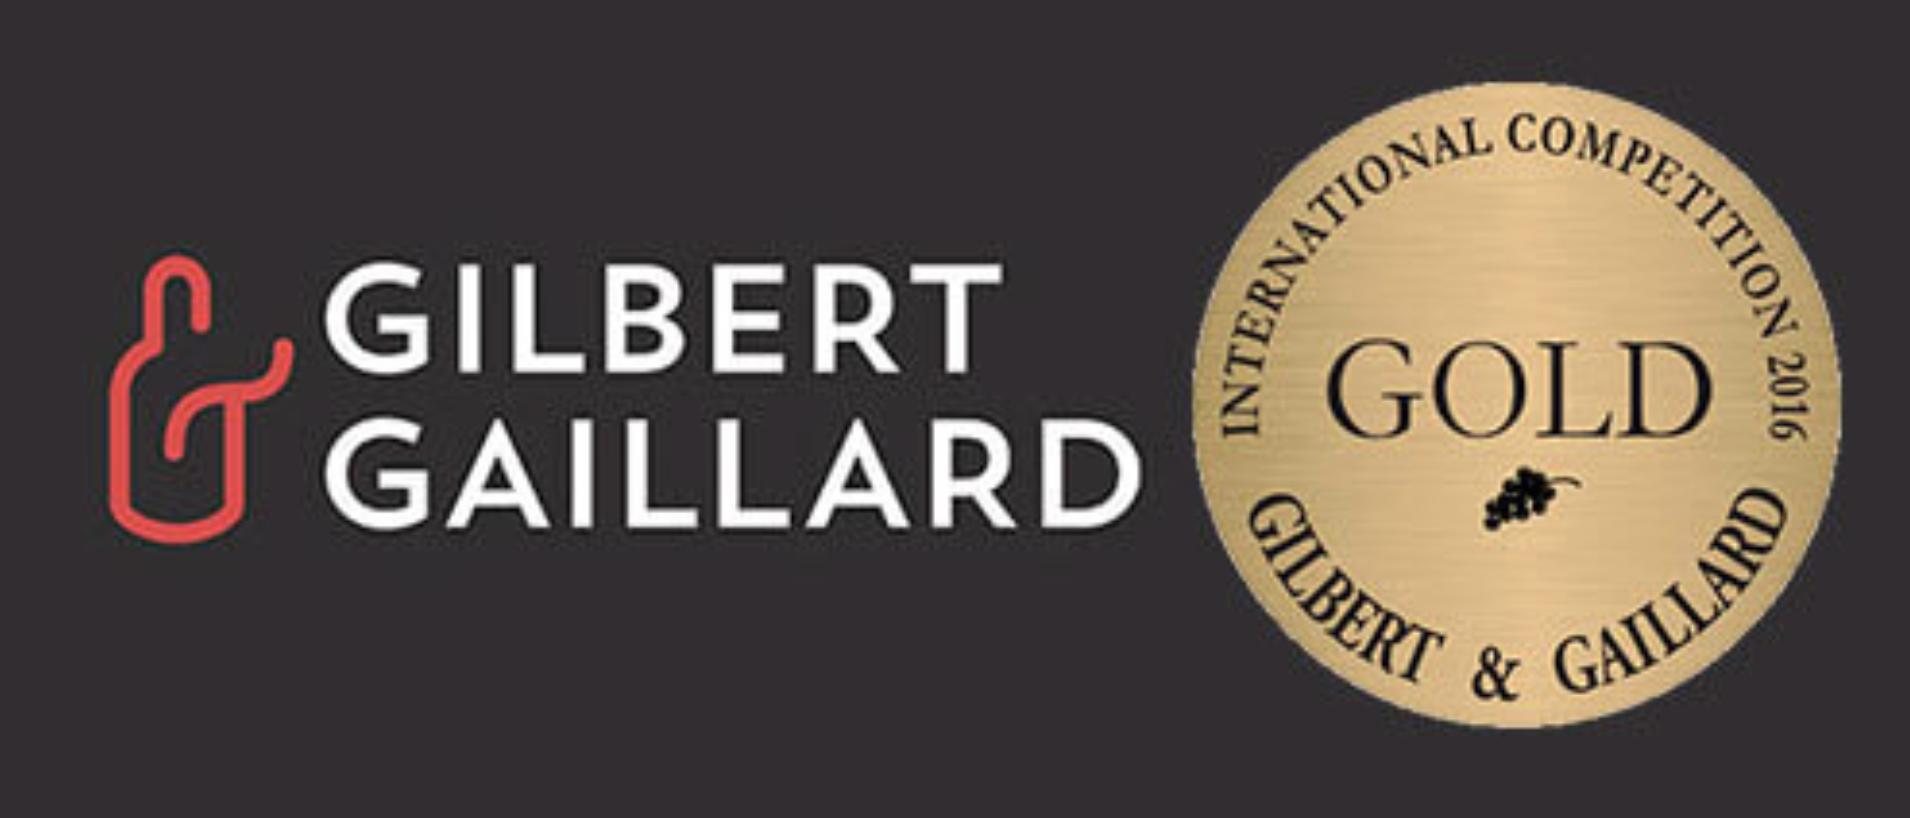 Gilbert & Gaillard 2017 - Gold Medal for Onepiò Lugana DOC 2016